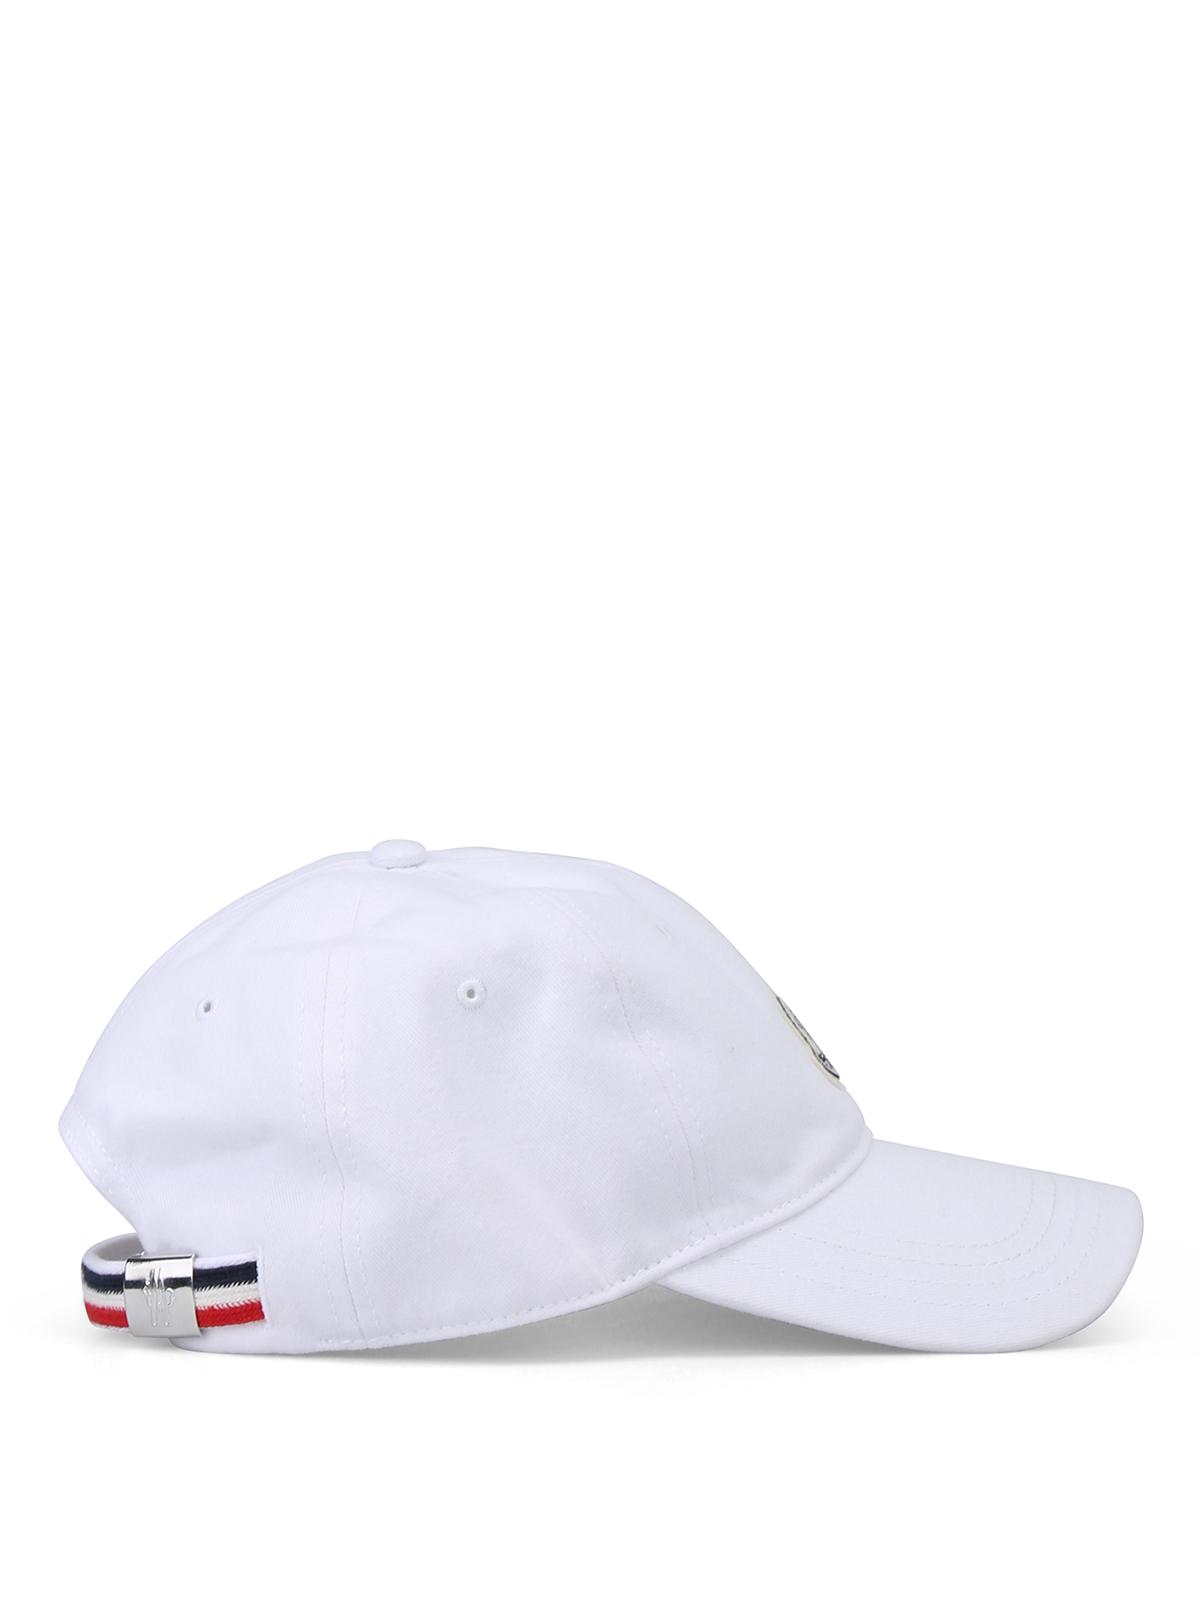 Moncler - Soft cotton baseball cap - hats   caps - D1 091 0020900 ... 5074b94b285